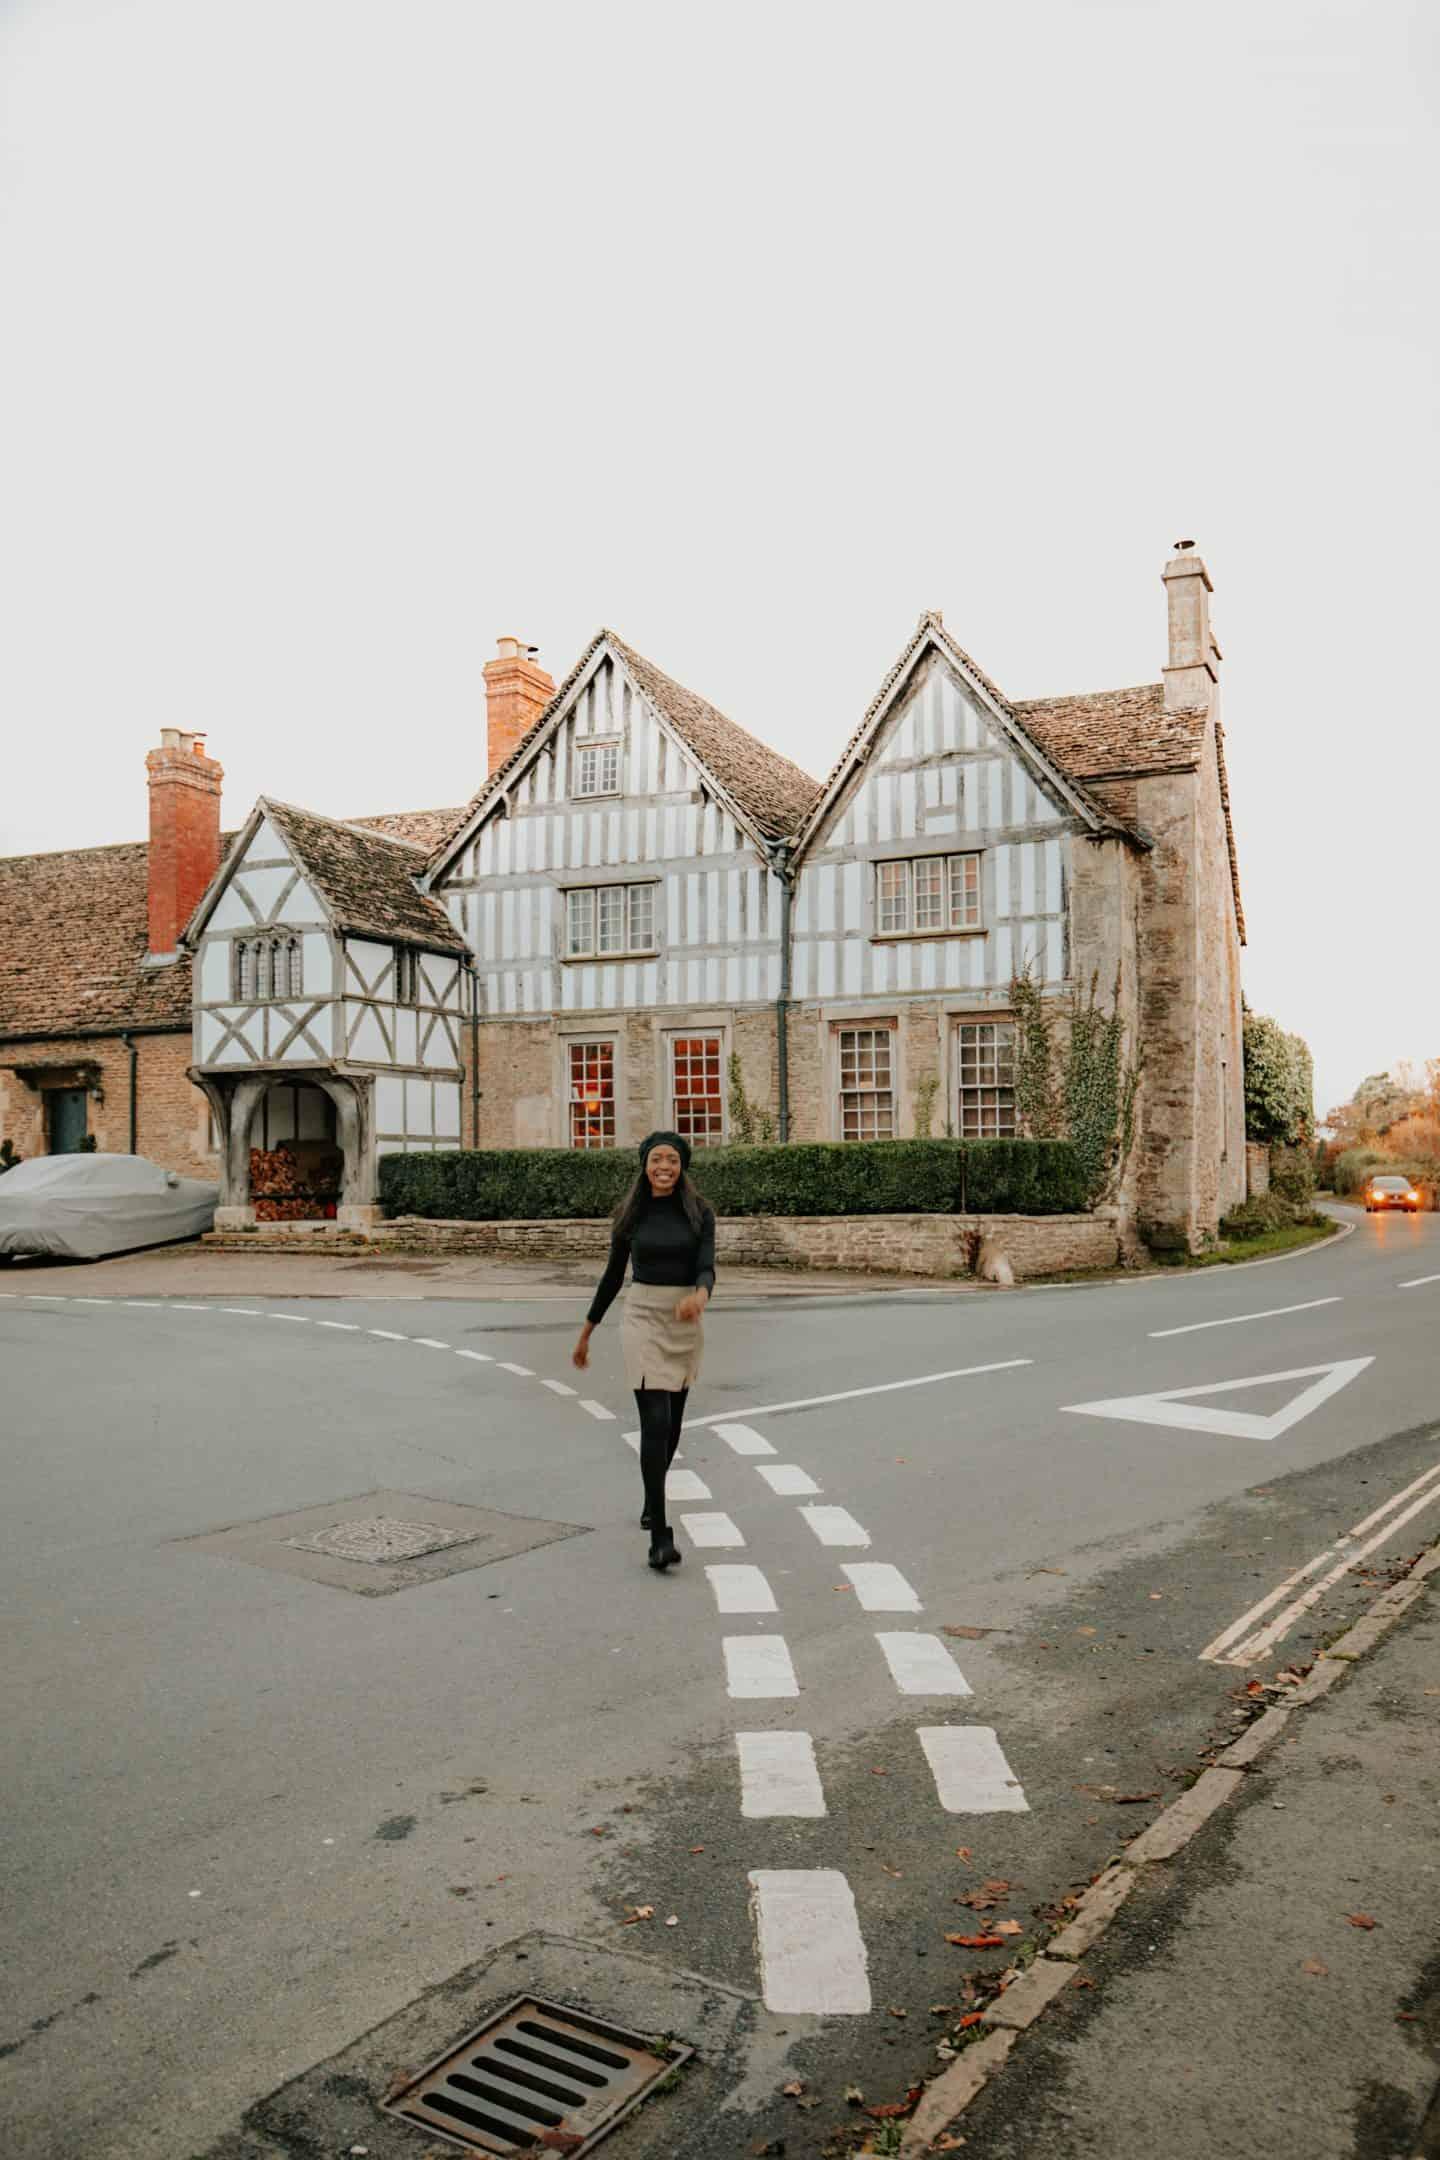 Lacock England's Most Famous Village